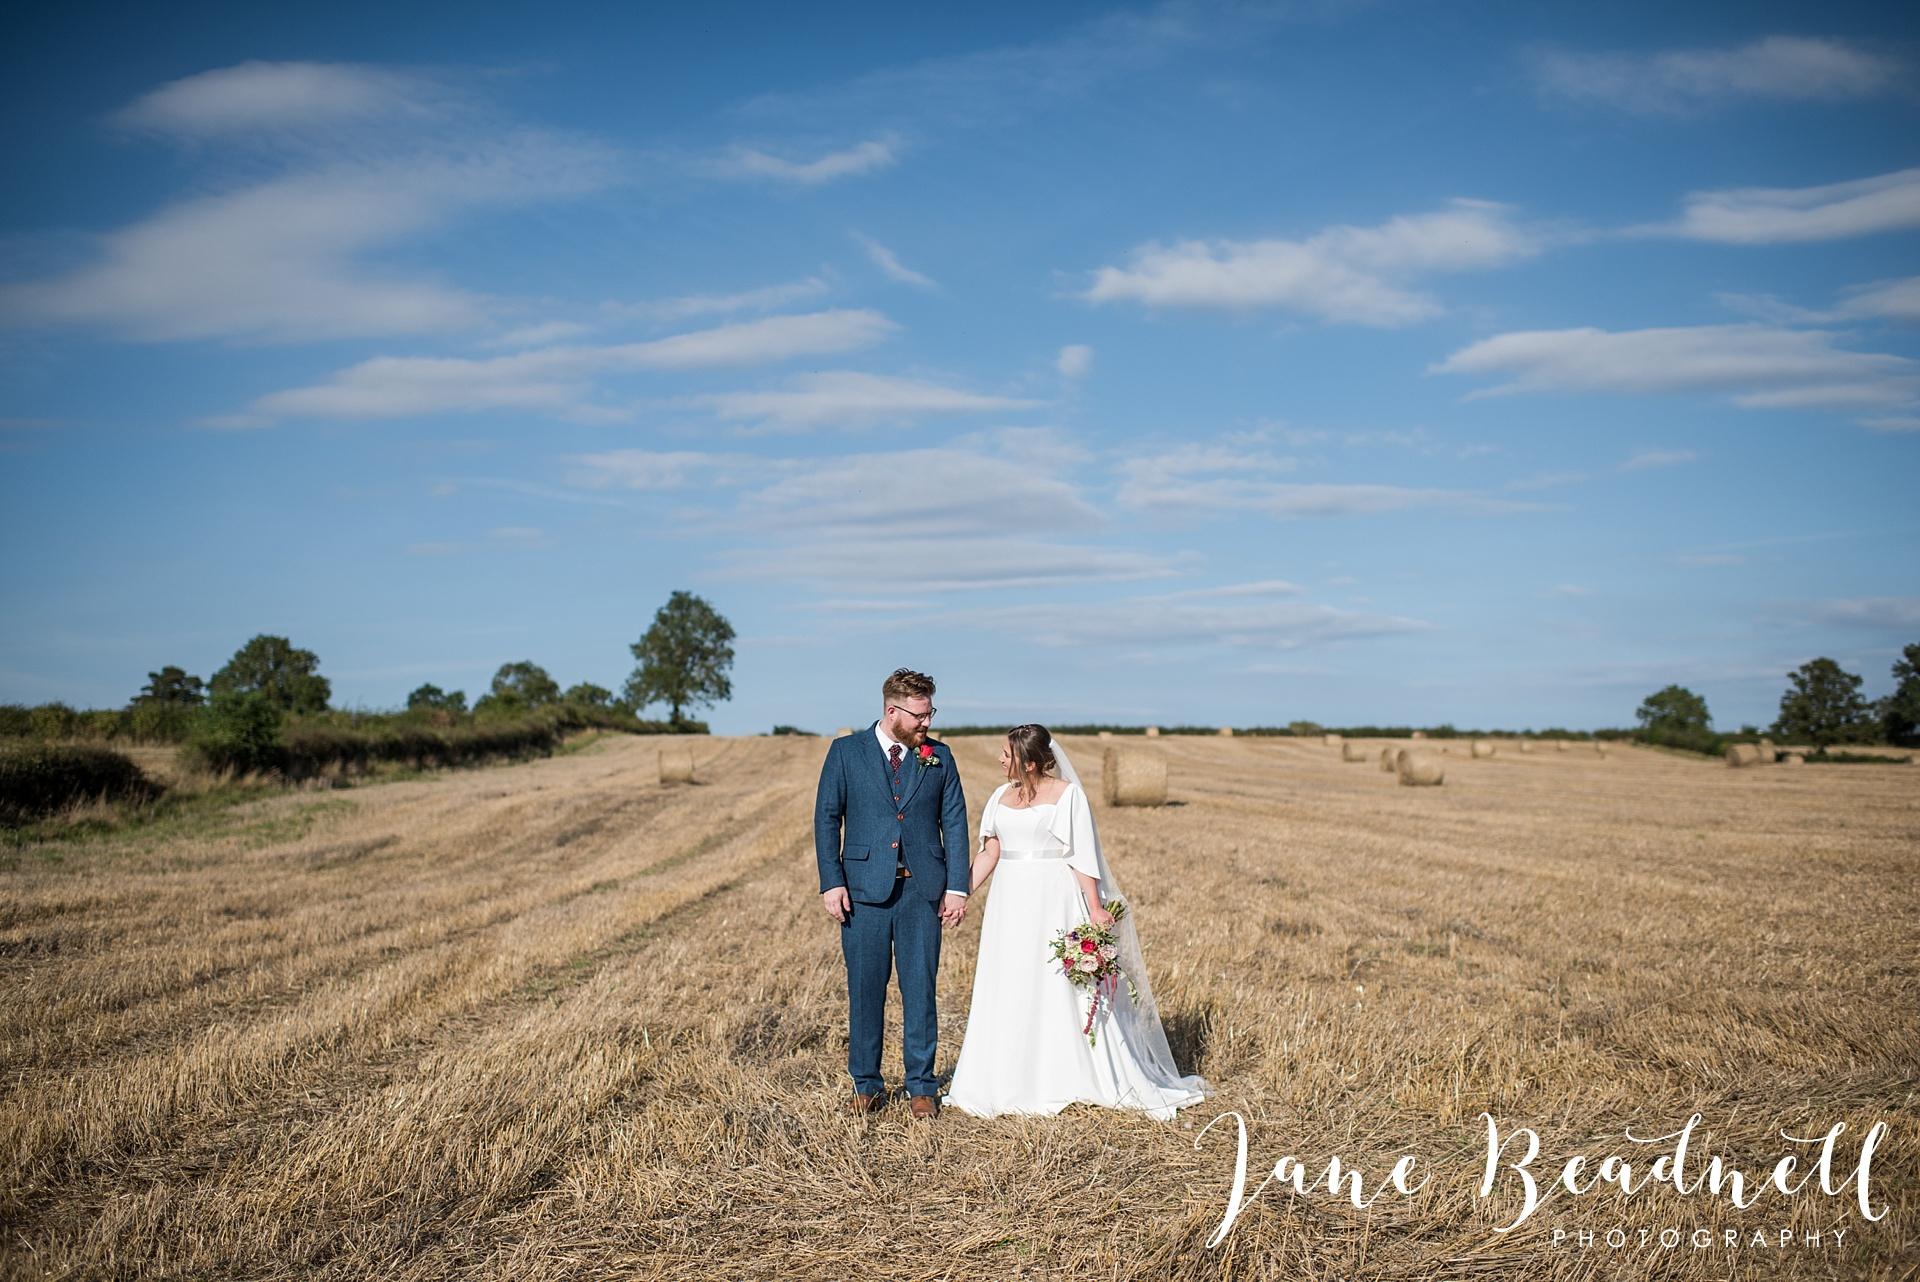 fine-art-wedding-photographer-jane-beadnell-yorkshire-wedding-photographer-garden-wedding_0066